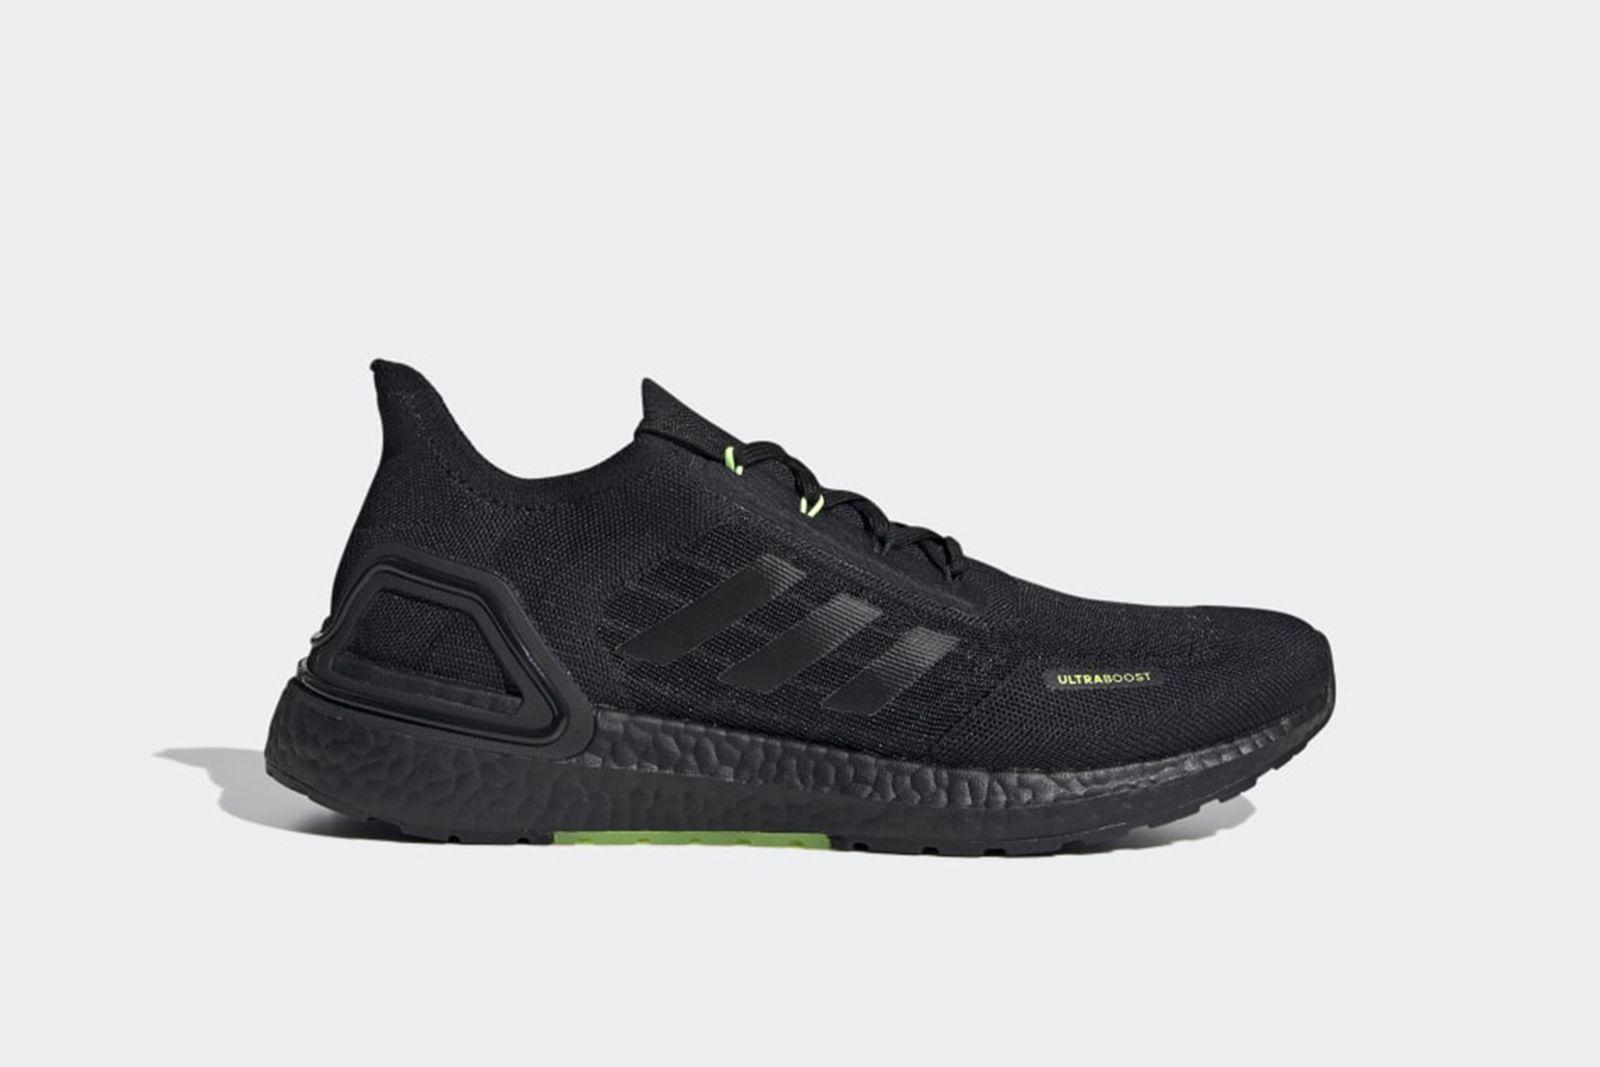 Ultraboost_SUMMER.RDY_Shoes_Black_EG0750_01_standard